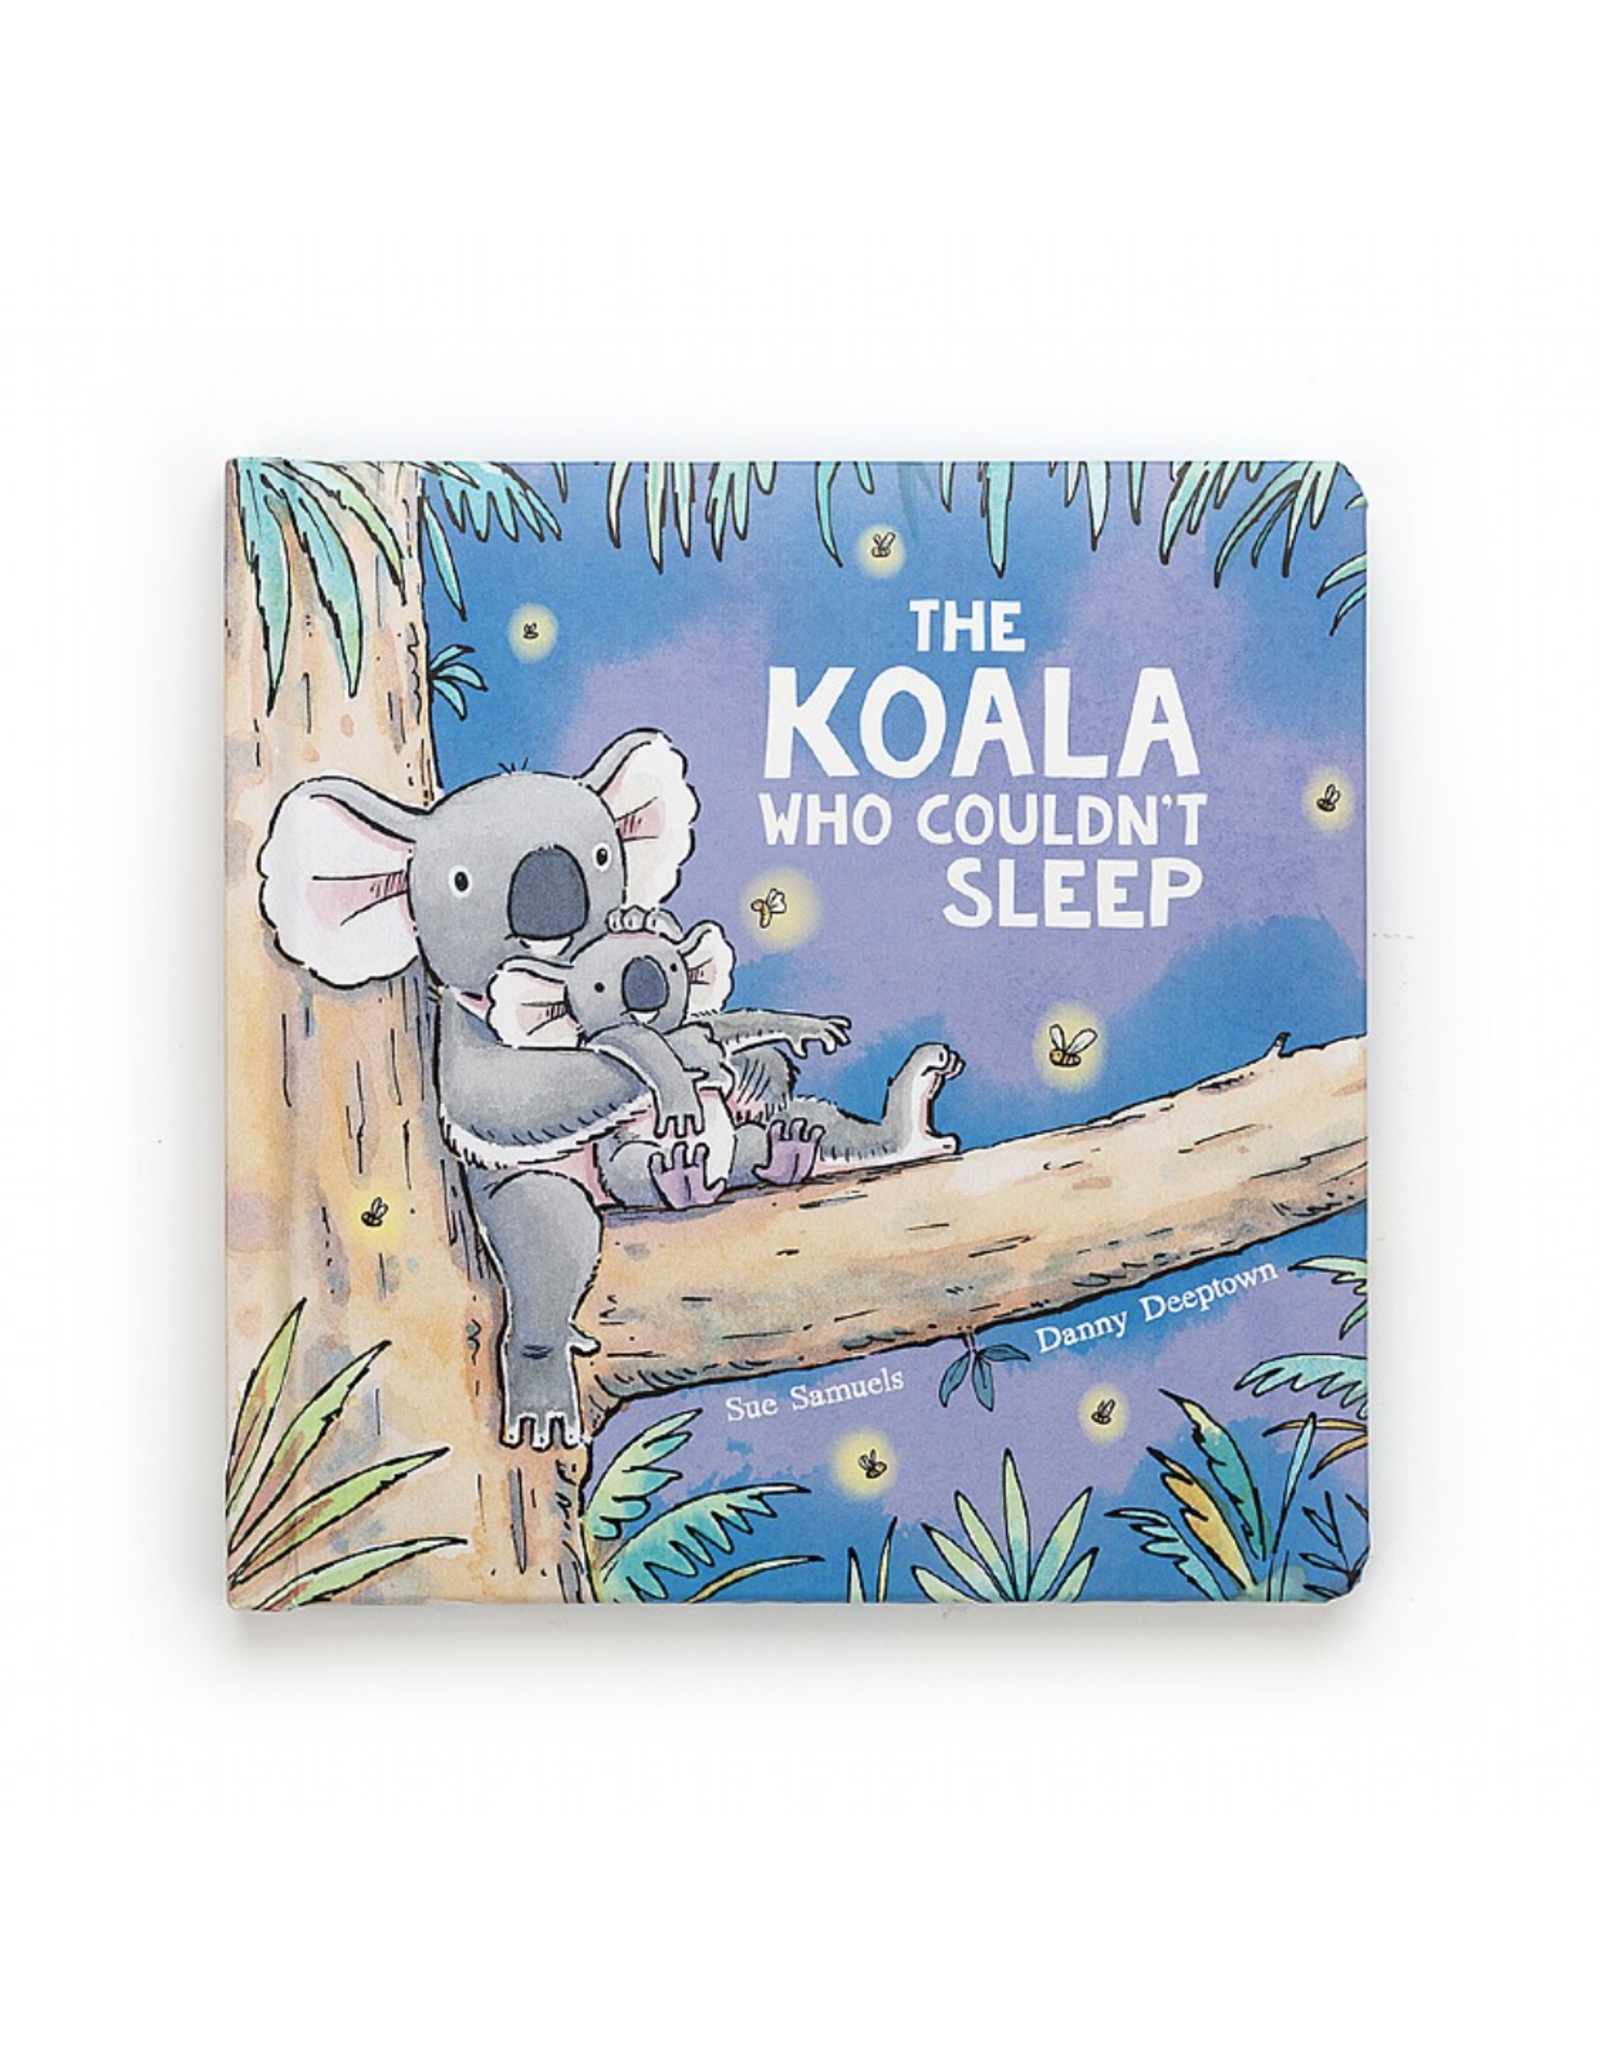 Jelly Cat Book The Koala Who Couldn't Sleep